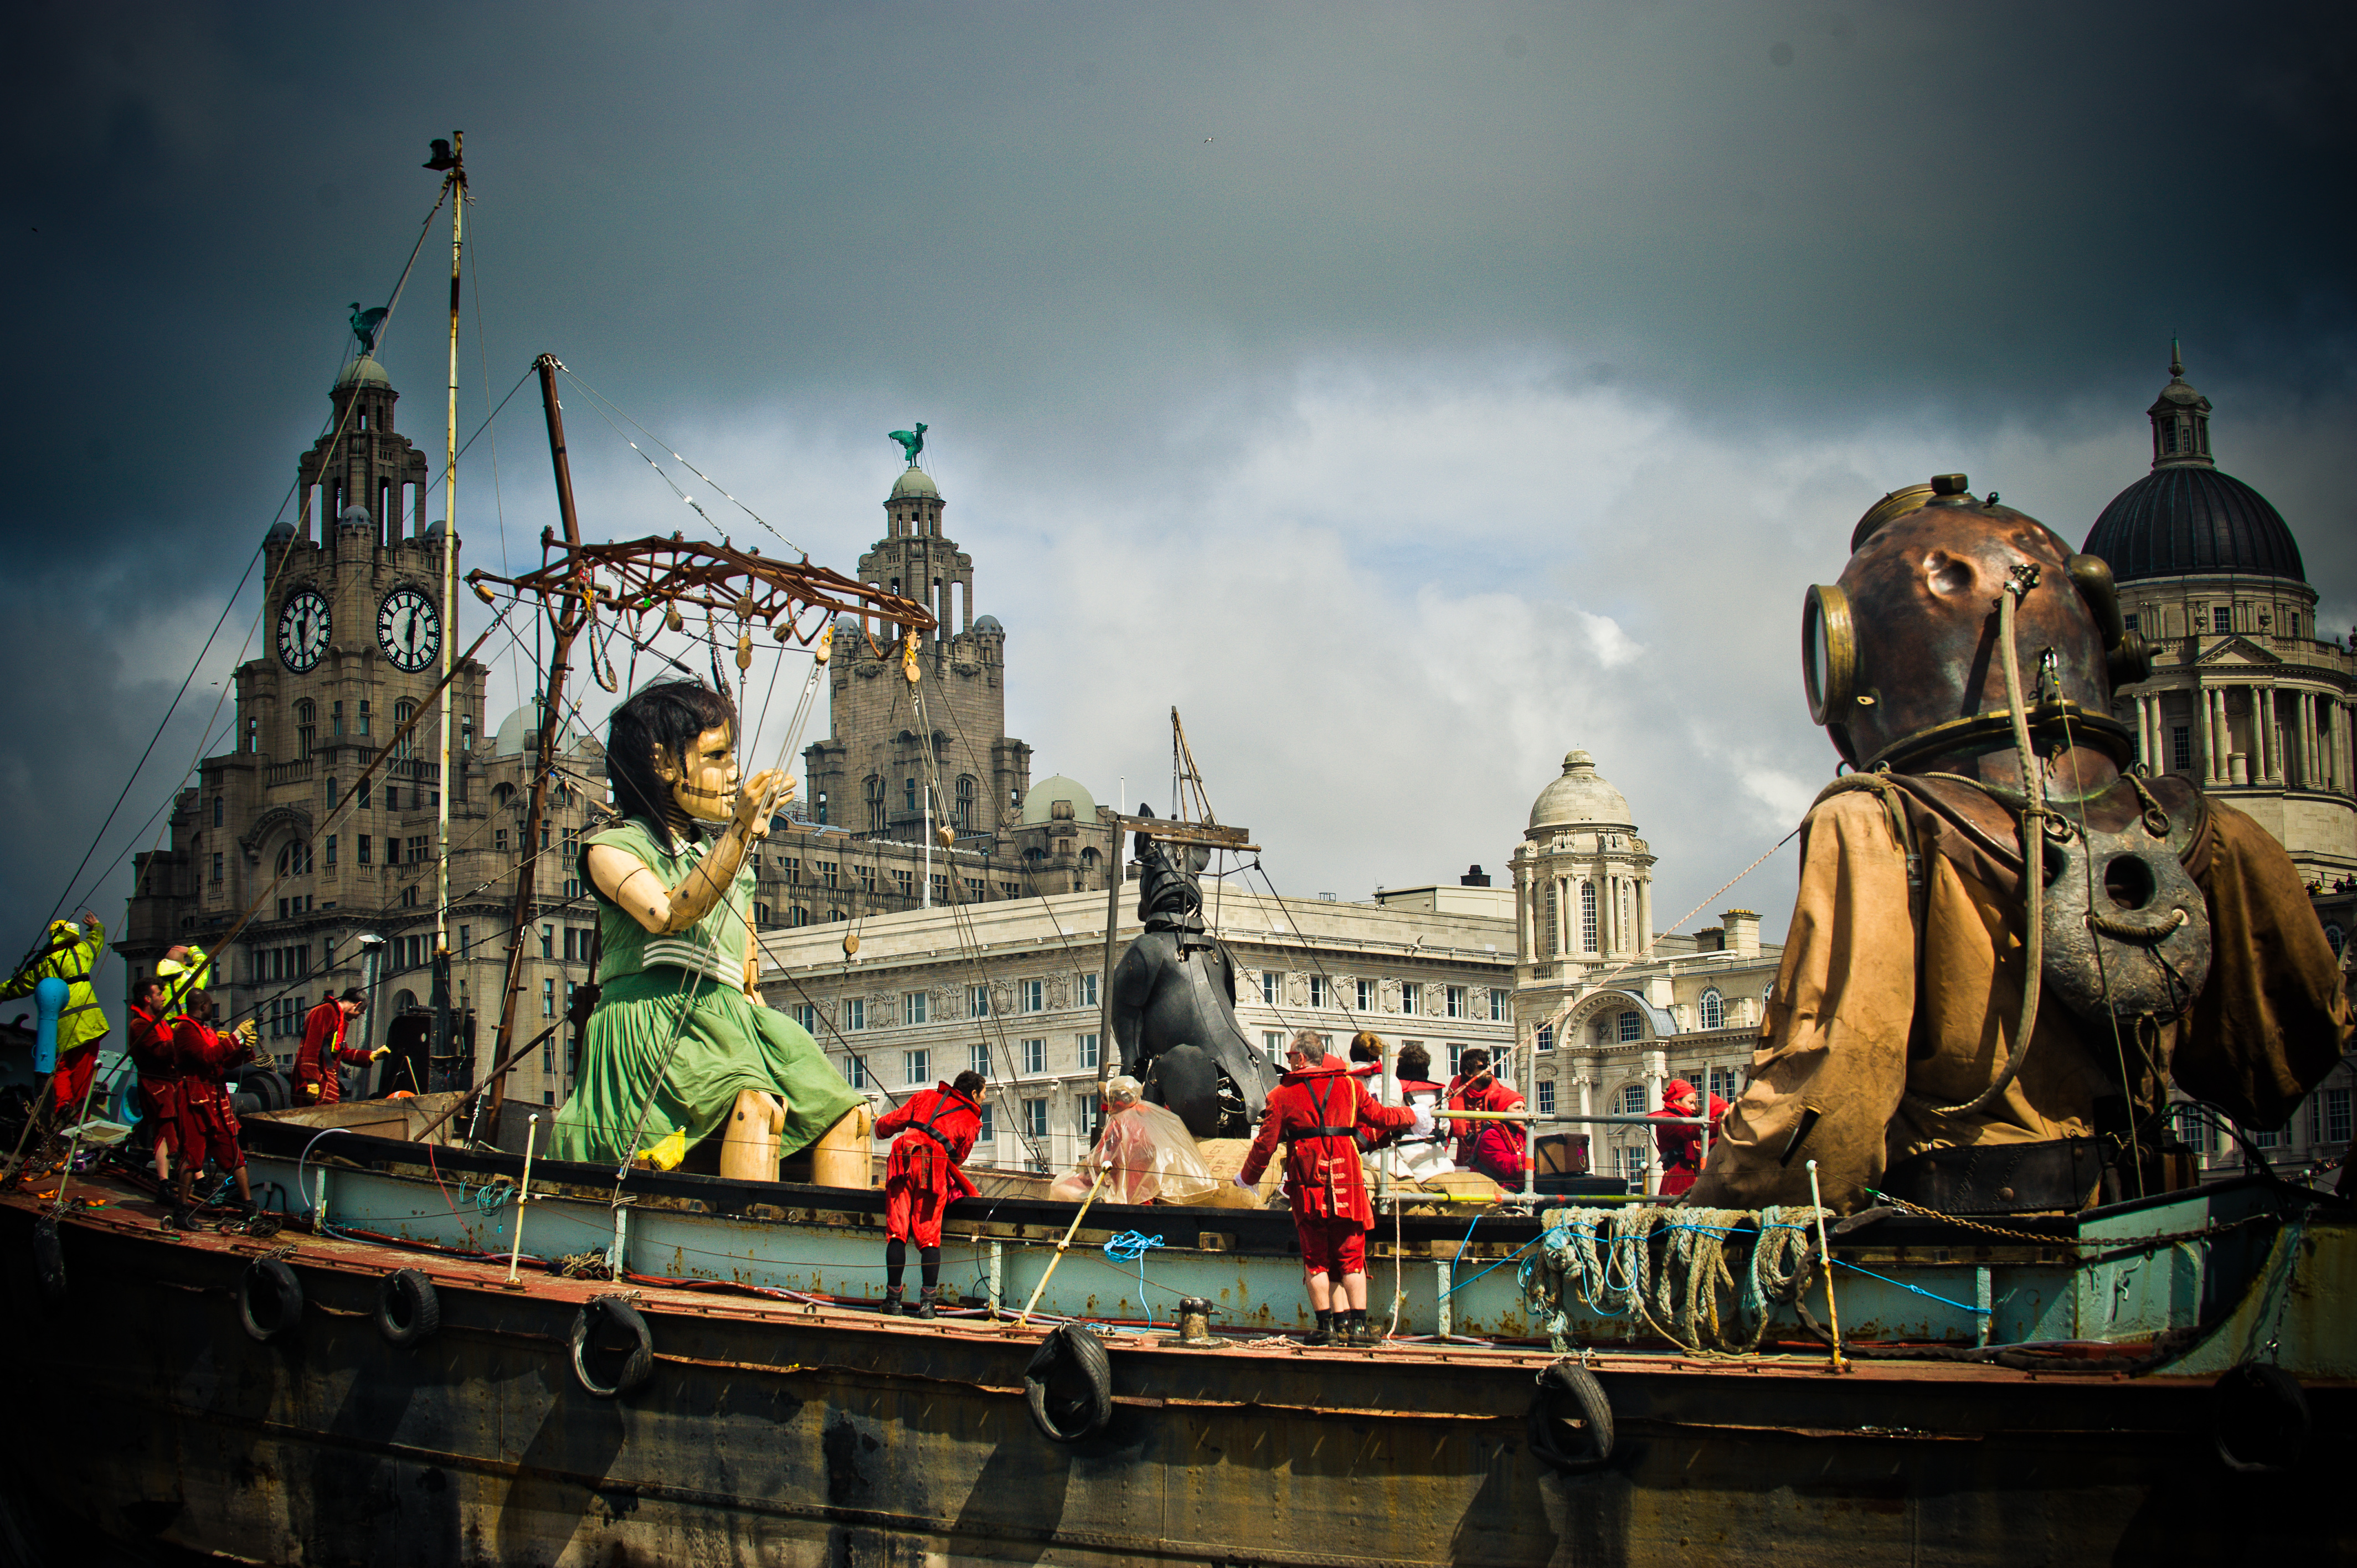 Giants Liverpoolin 2012